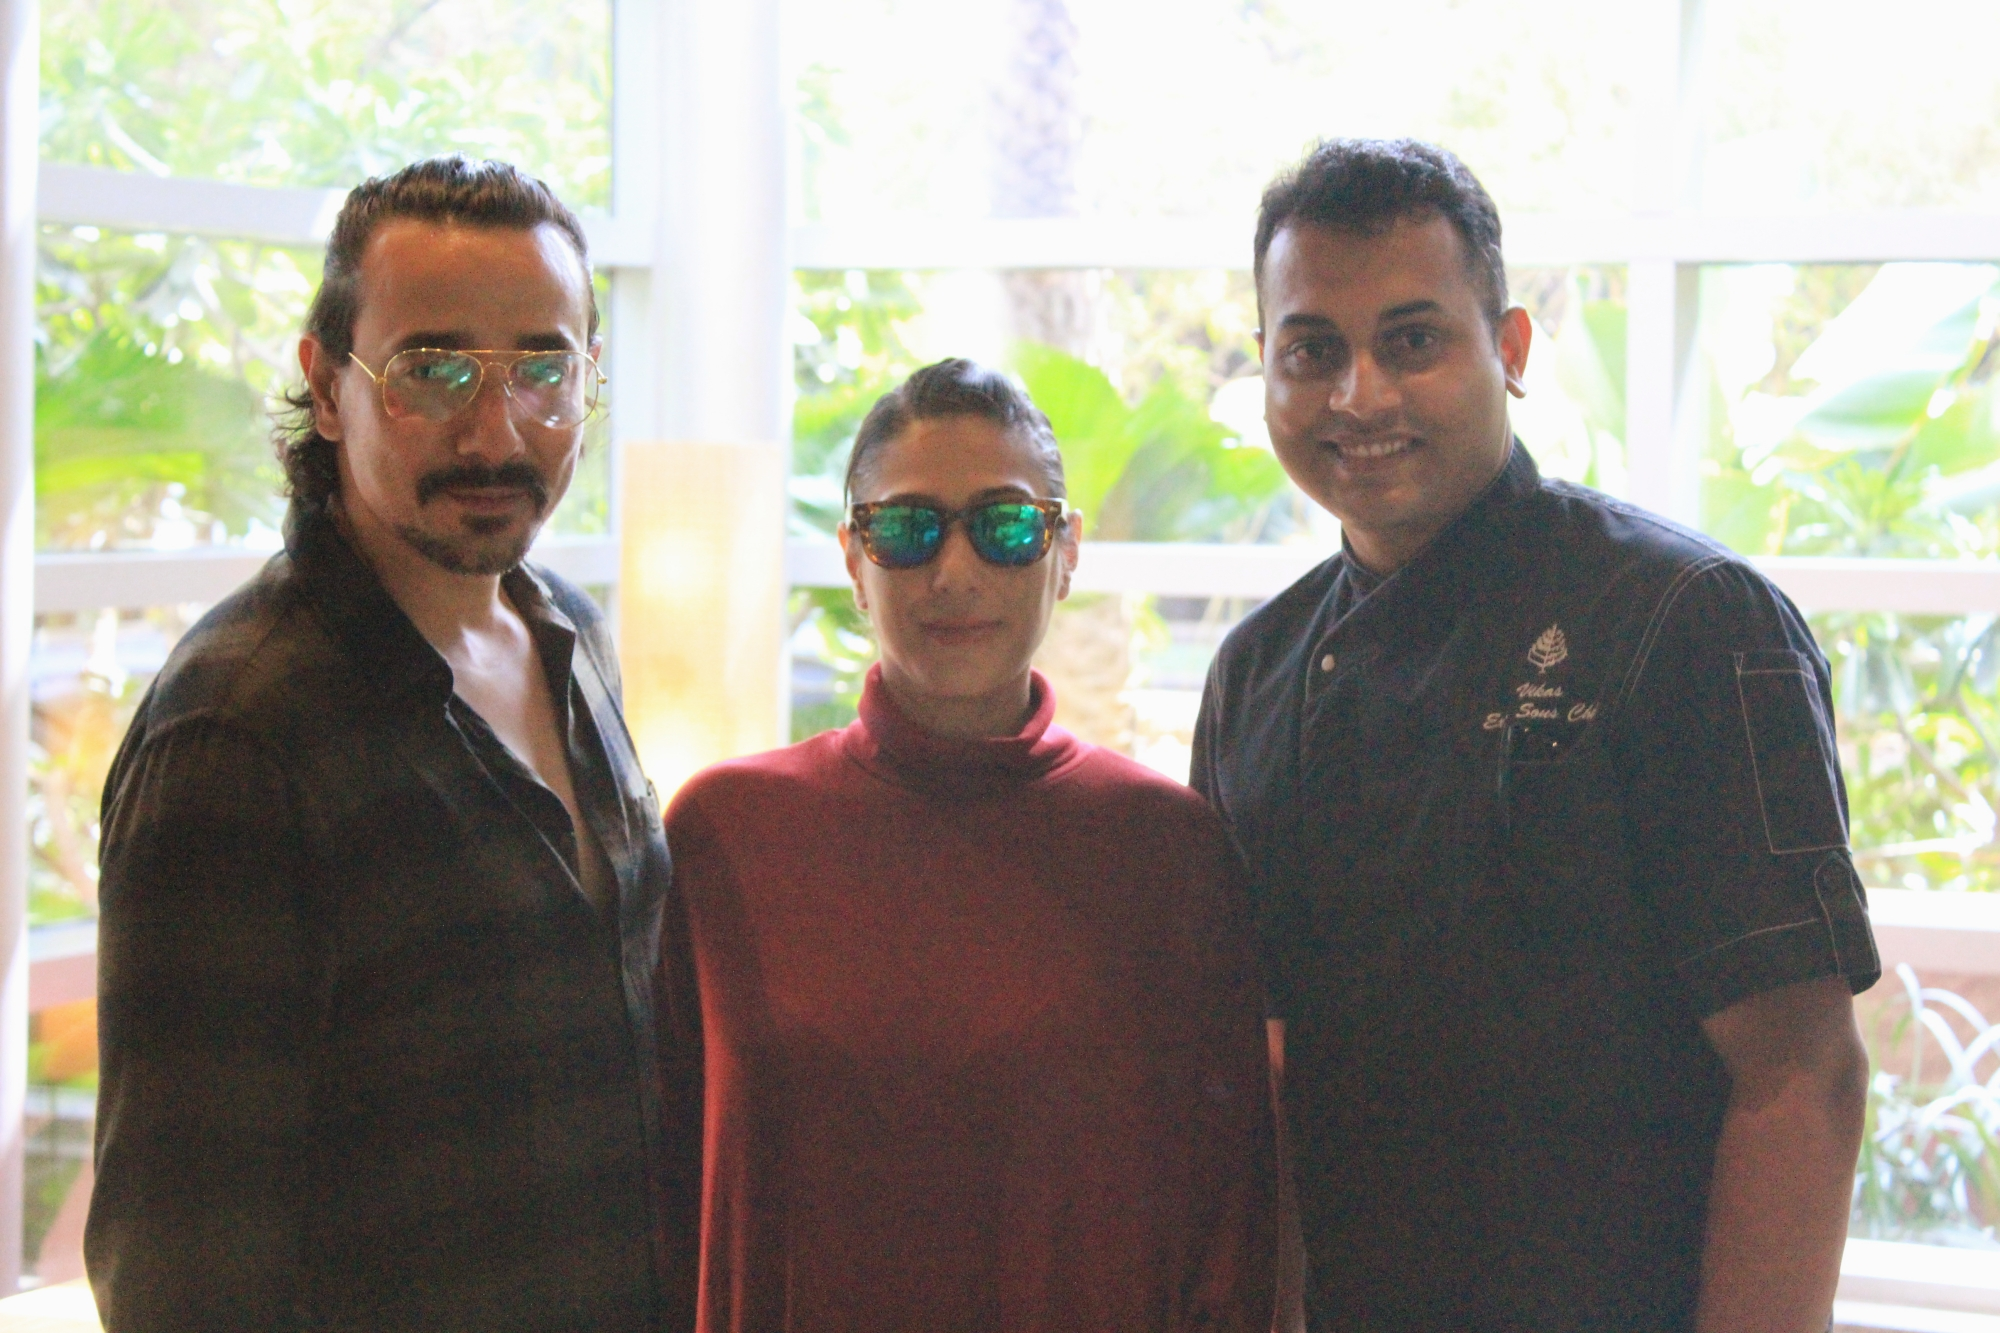 Mantra actor, Veidehi and Chef Vikas Singh